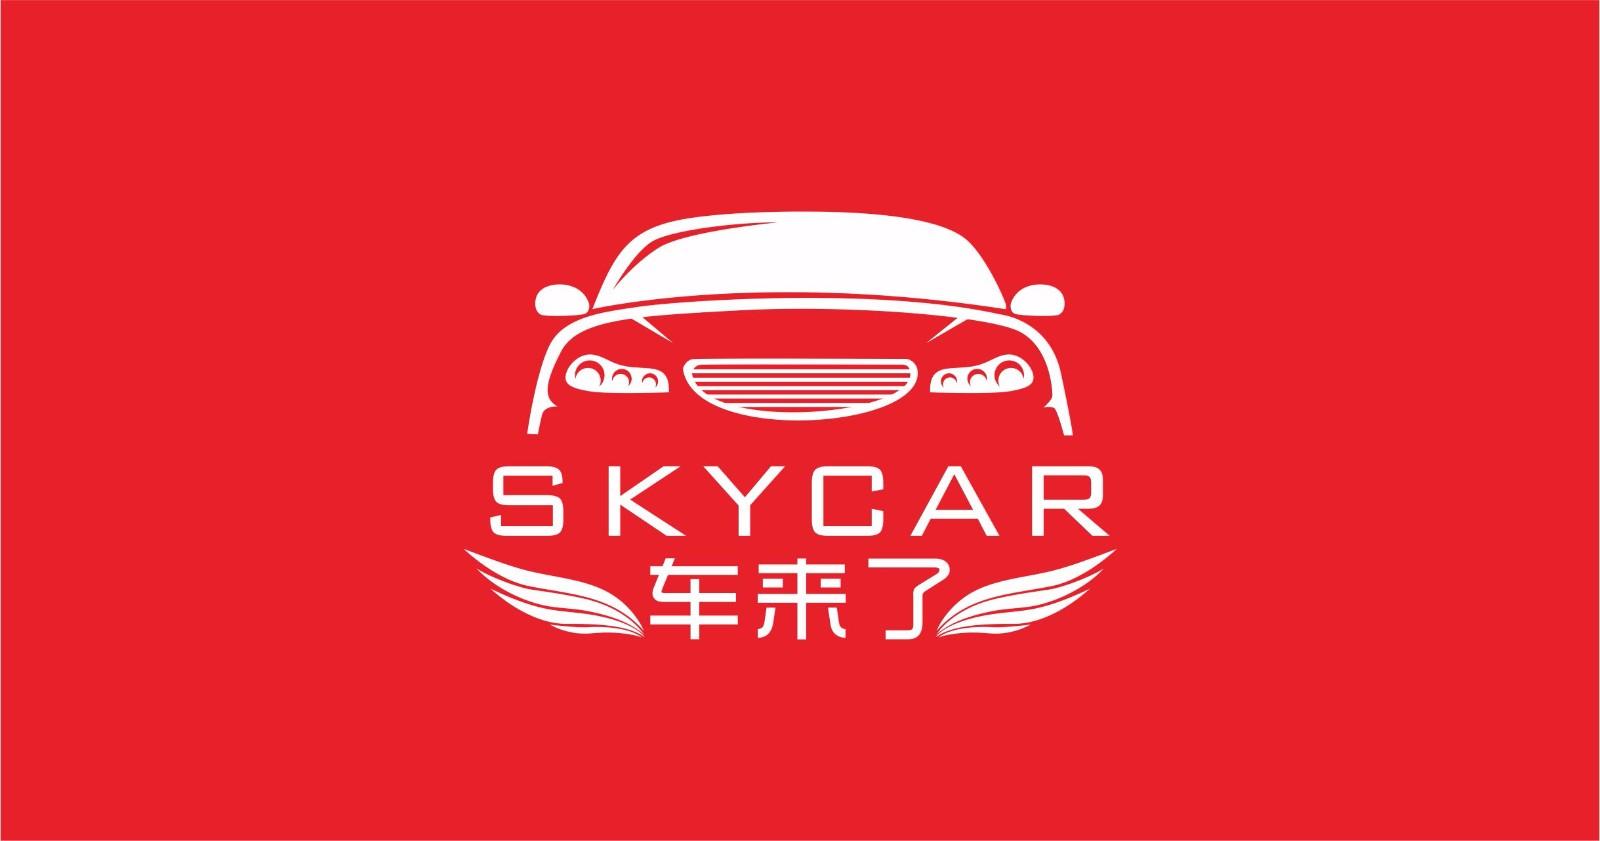 Skycar车来了